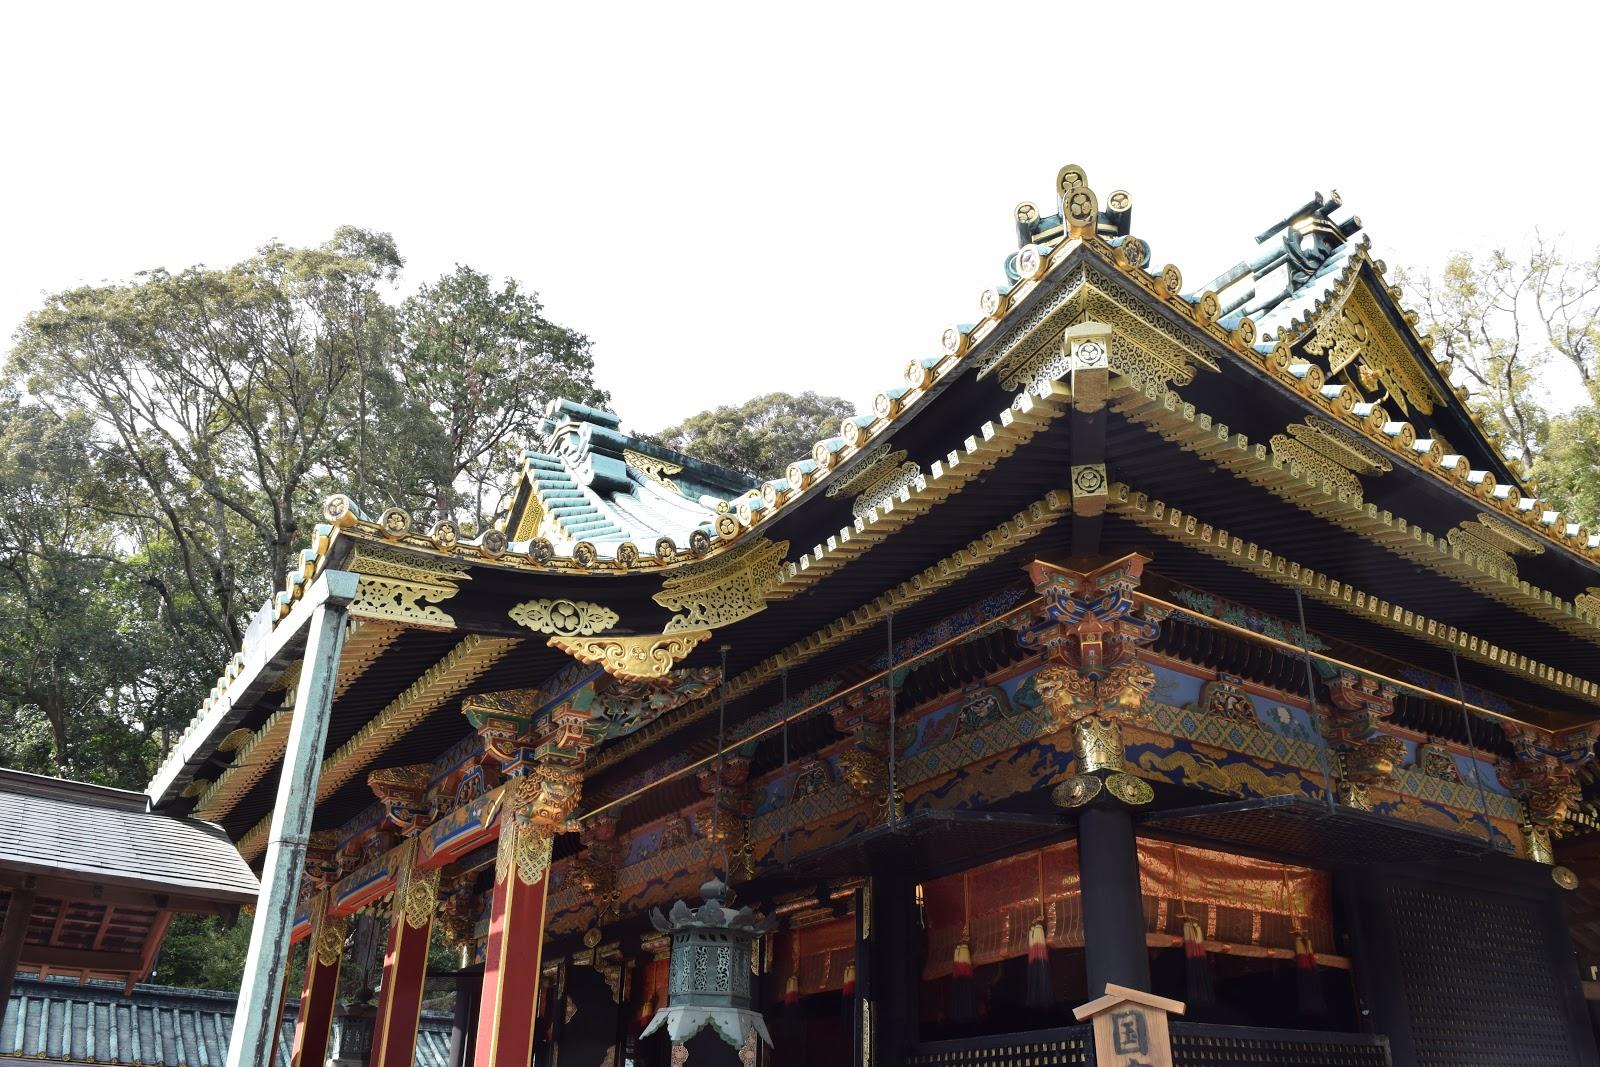 Kunozan Toshogu in Shizuoka Japan